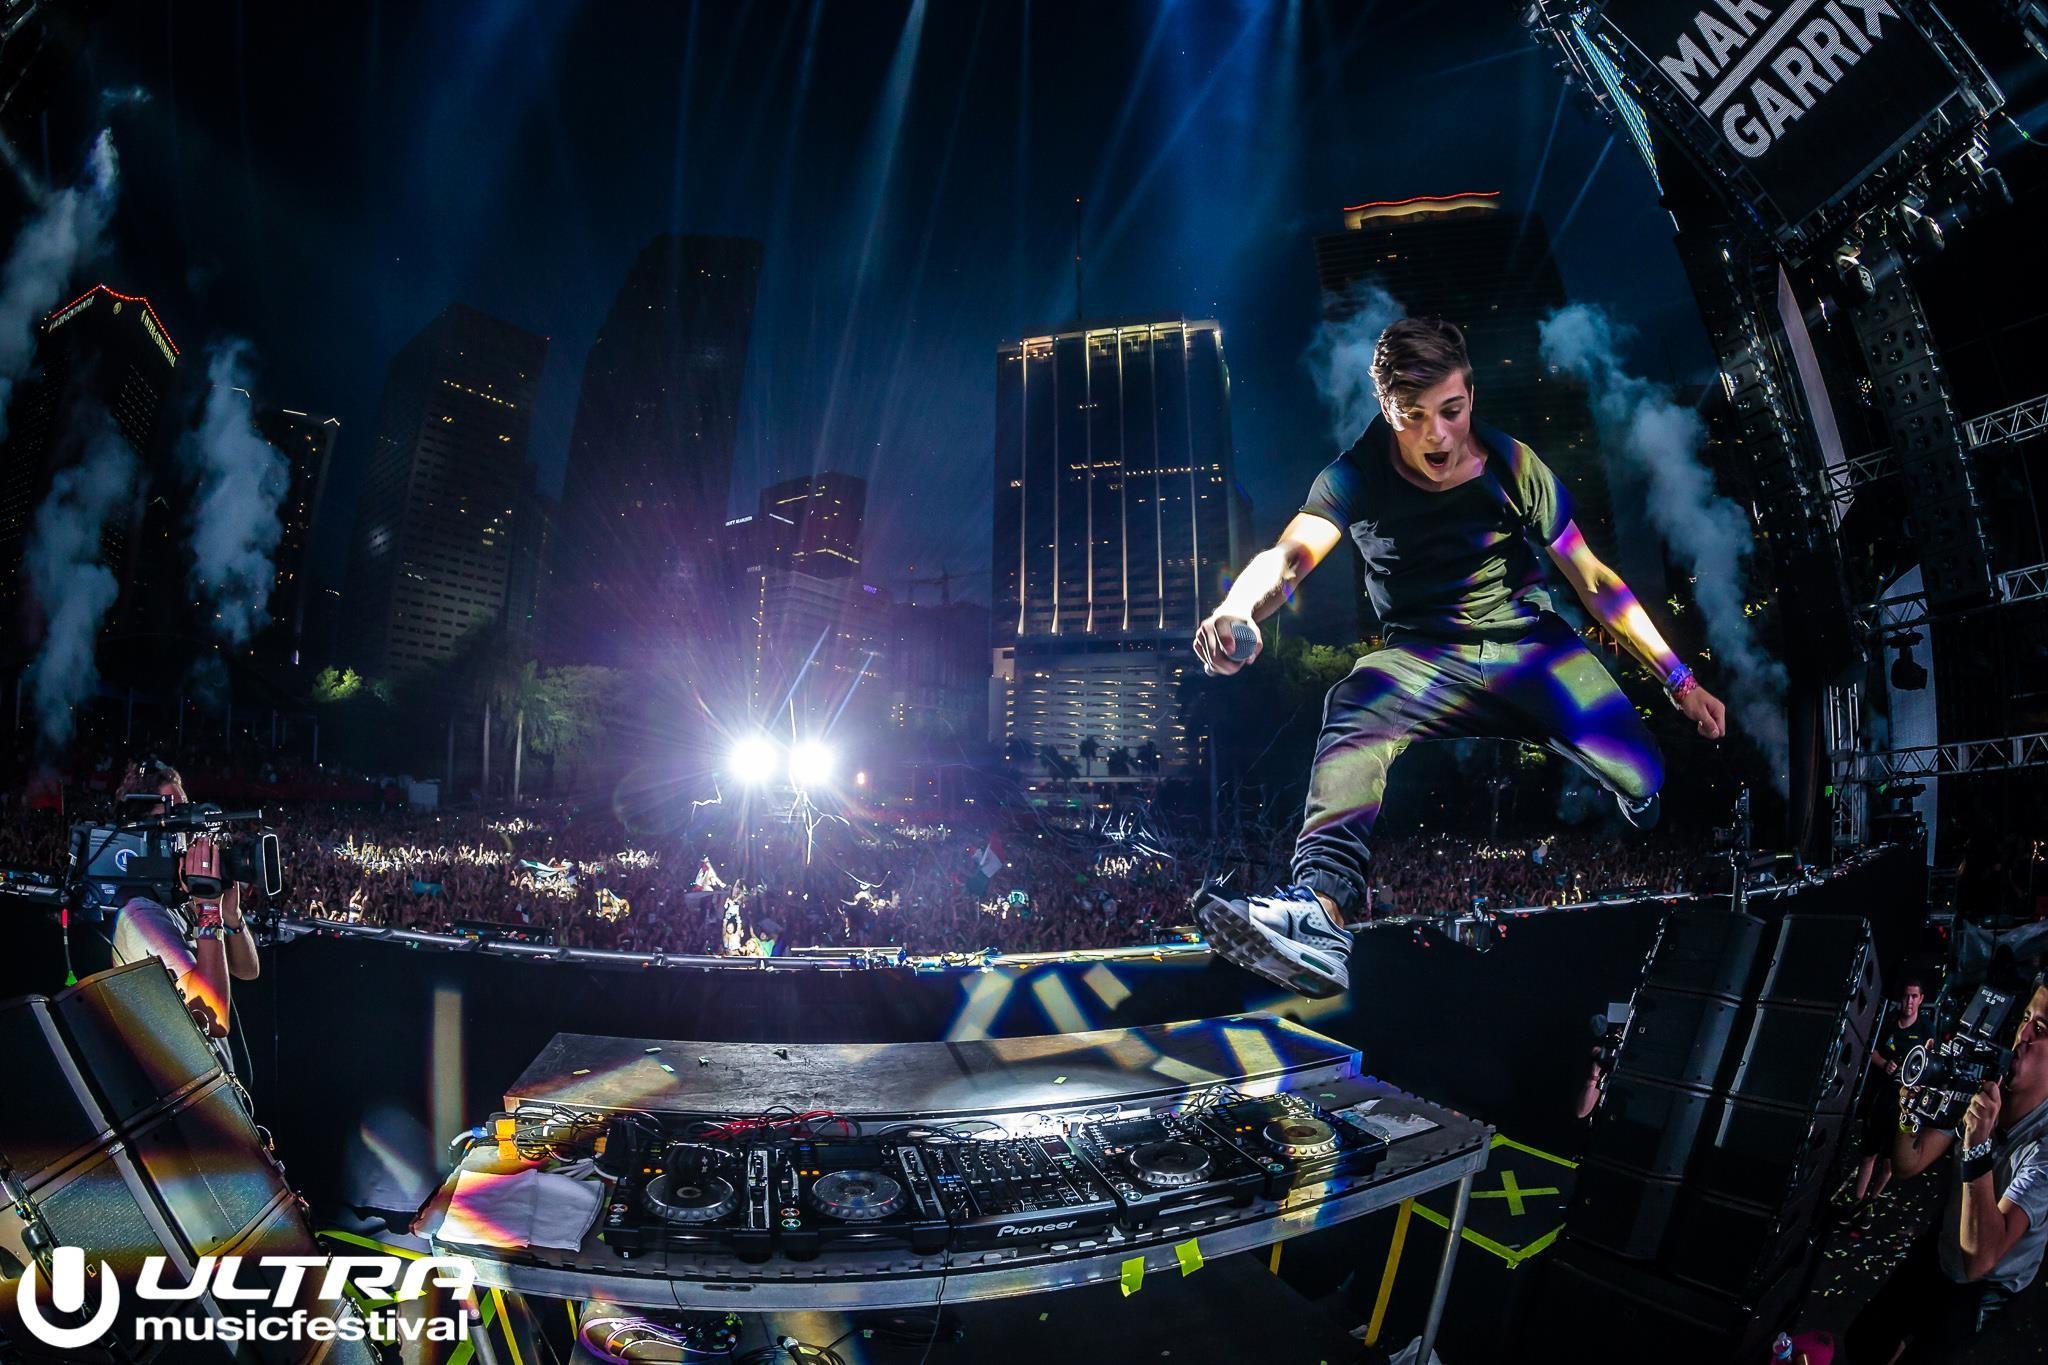 Martin Garrix Reveals Ed Sheeran Collaboration At Ultra Music Festival |  Your EDM